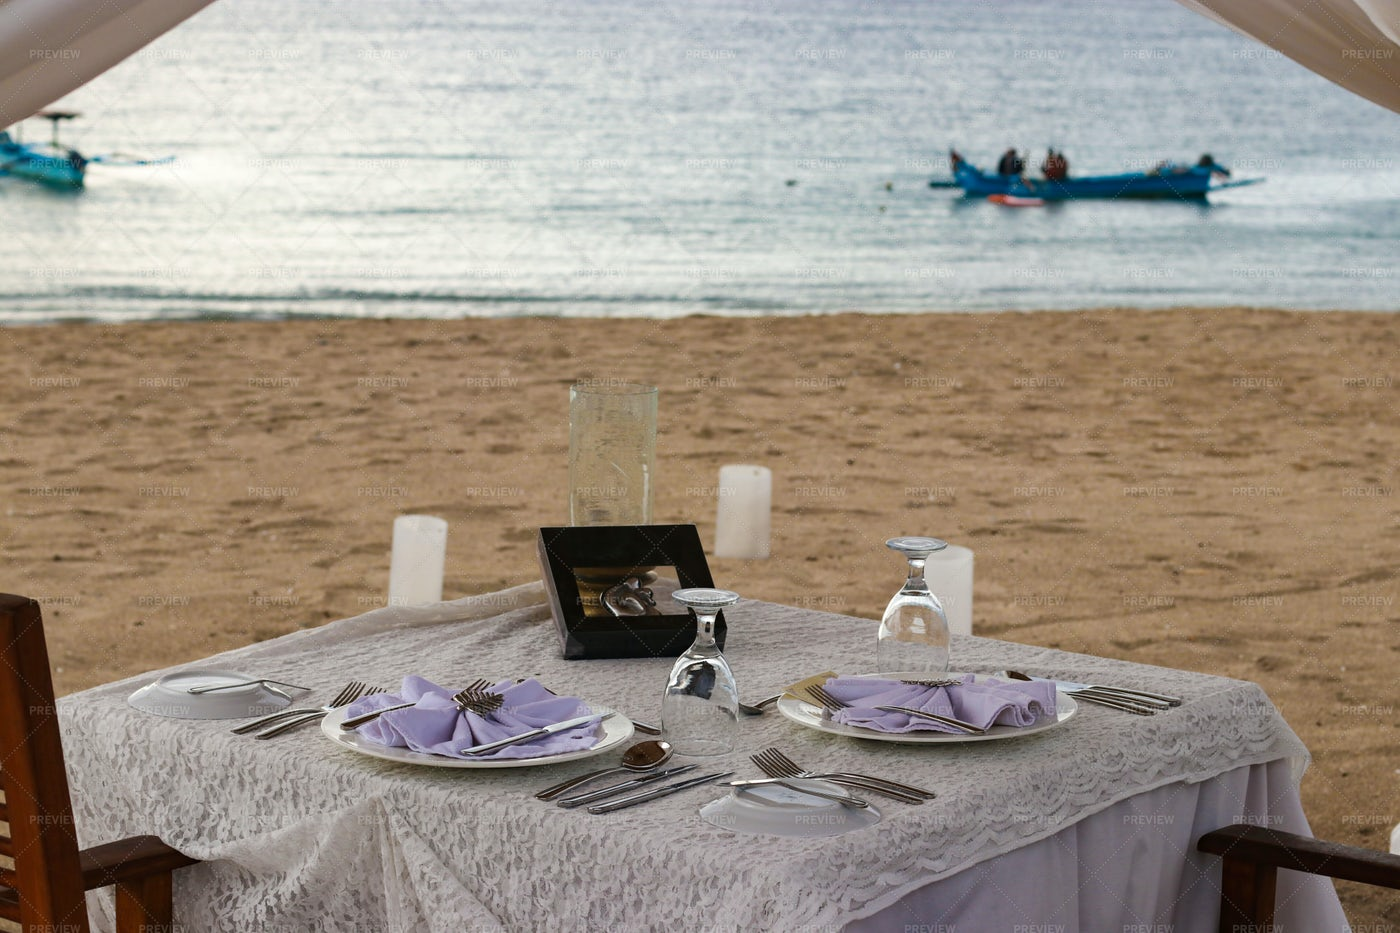 Romantic Dinner By The Ocean: Stock Photos